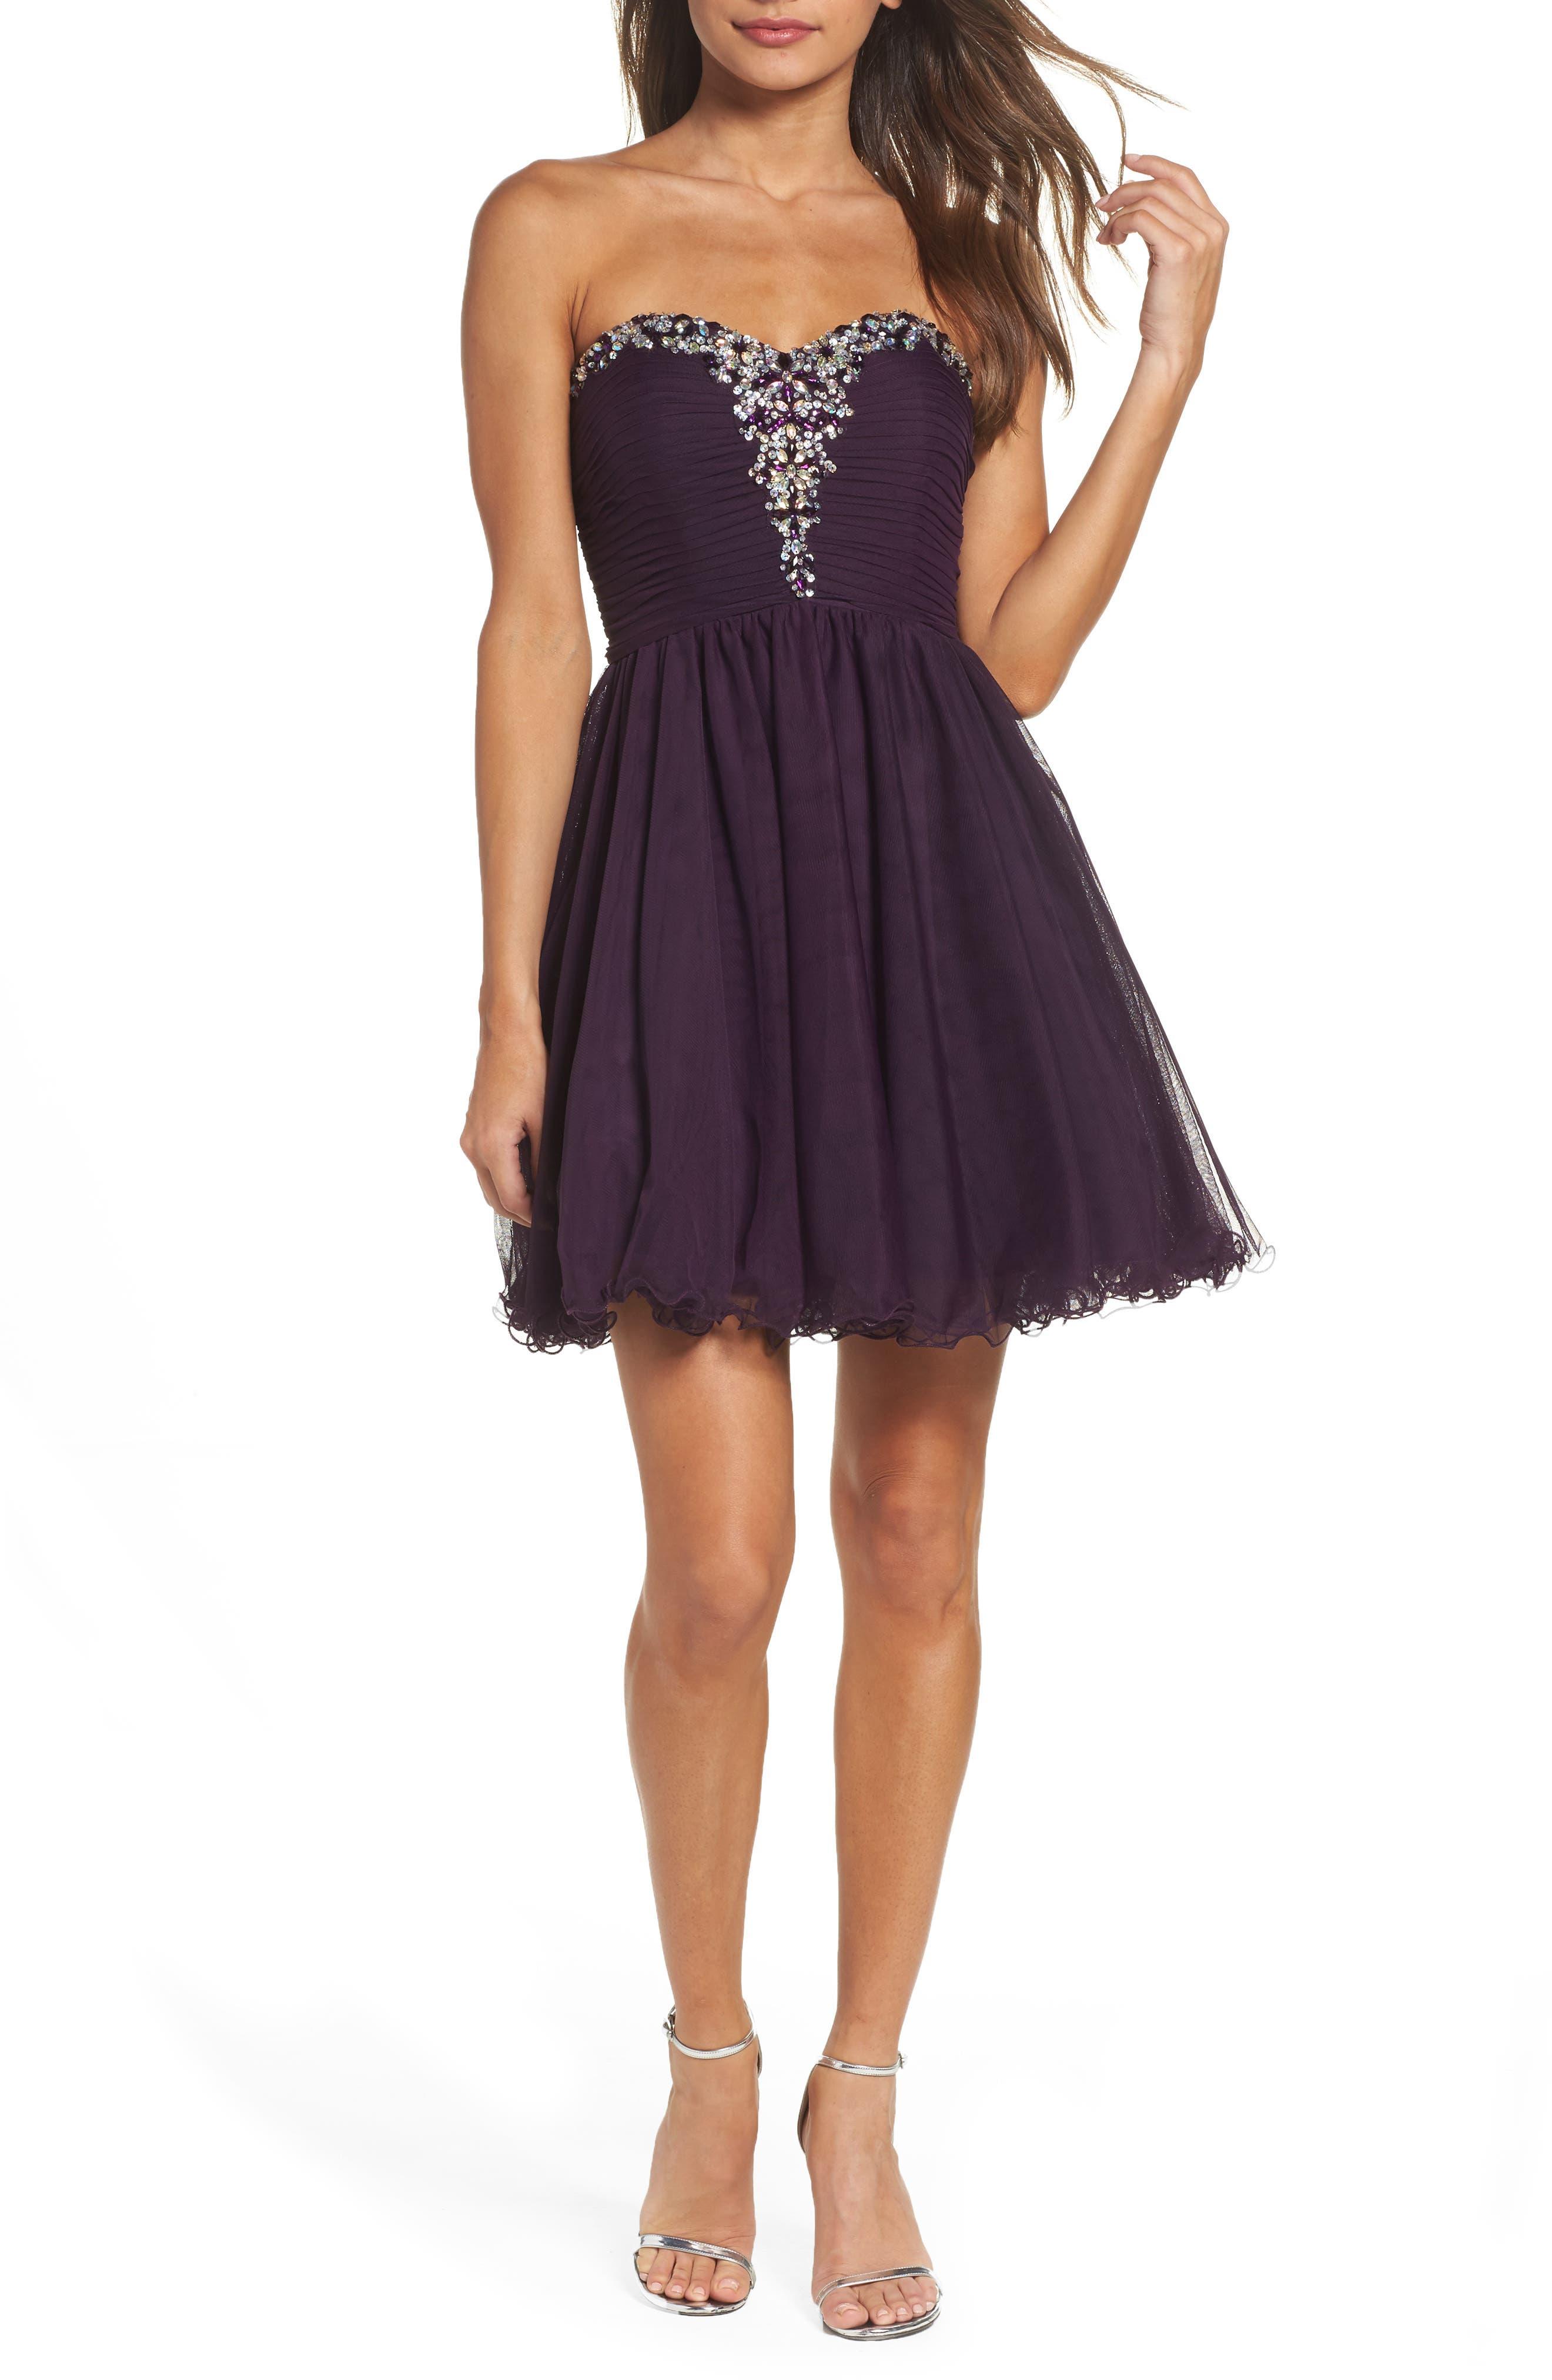 Blondie Nites Embellished Strapless Fit & Flare Dress